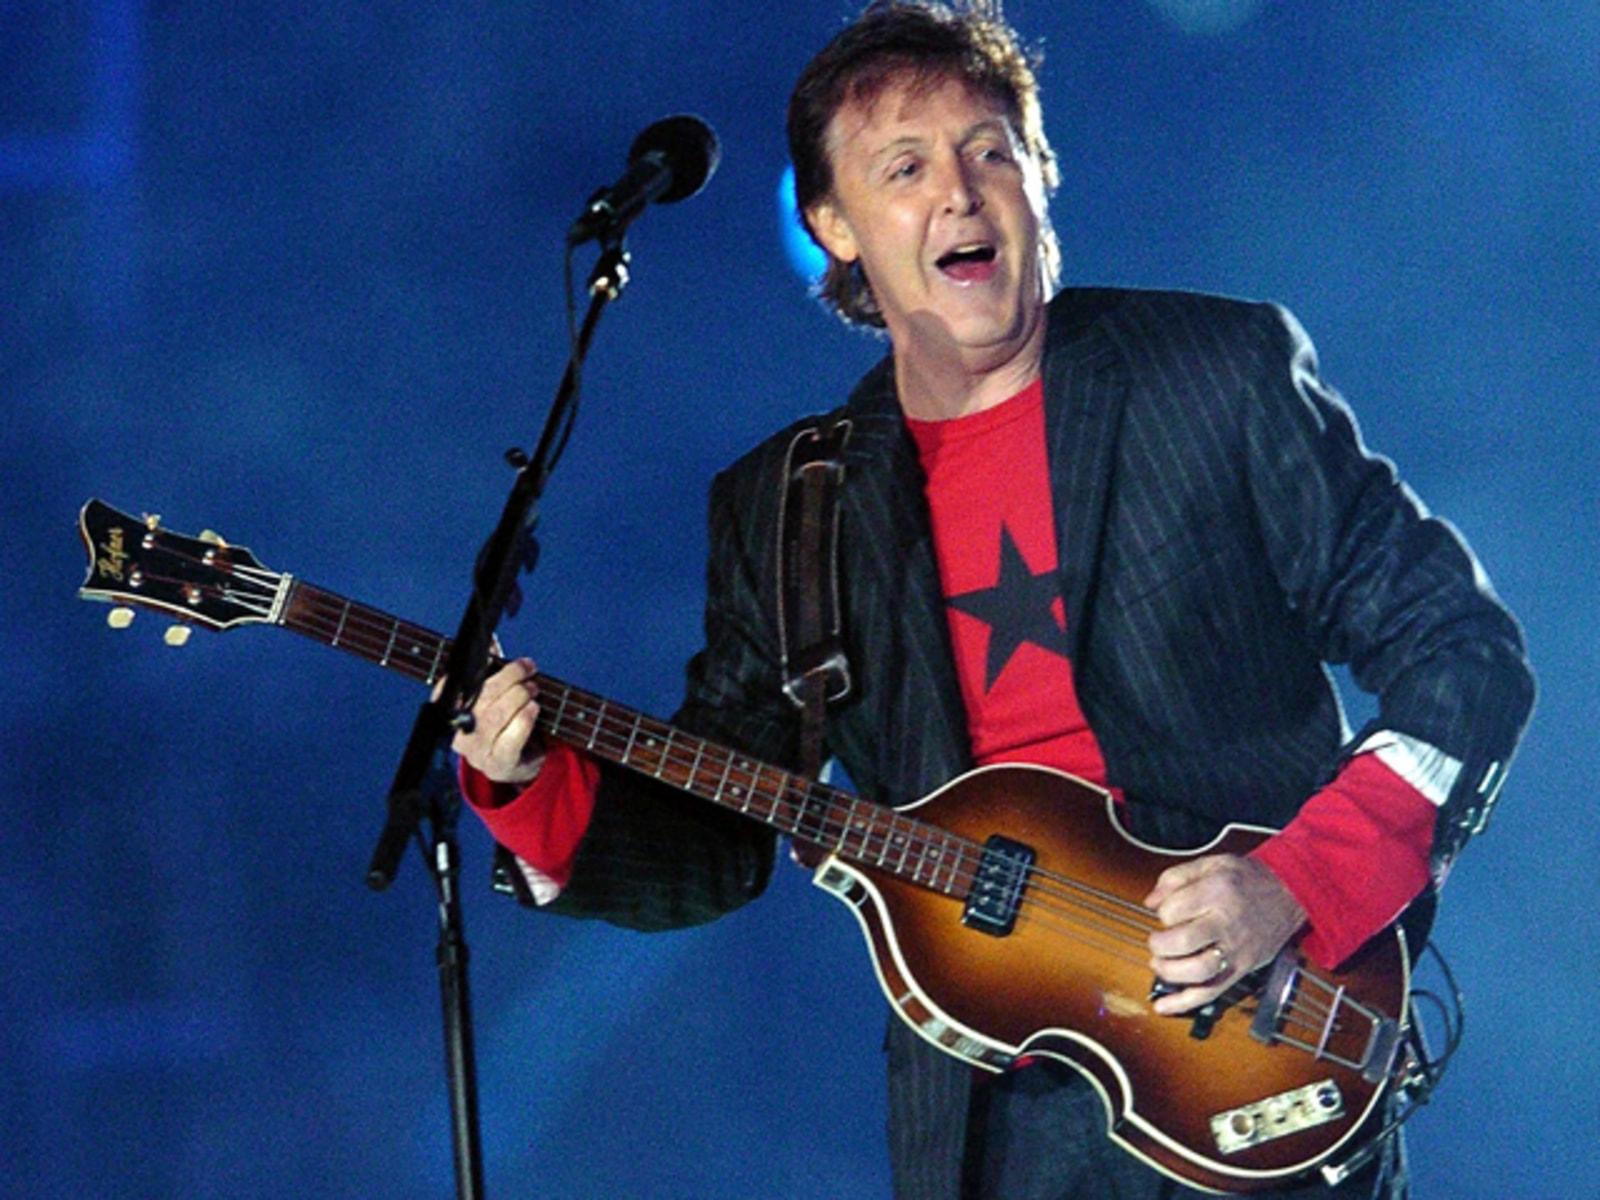 Image: Paul McCartney.